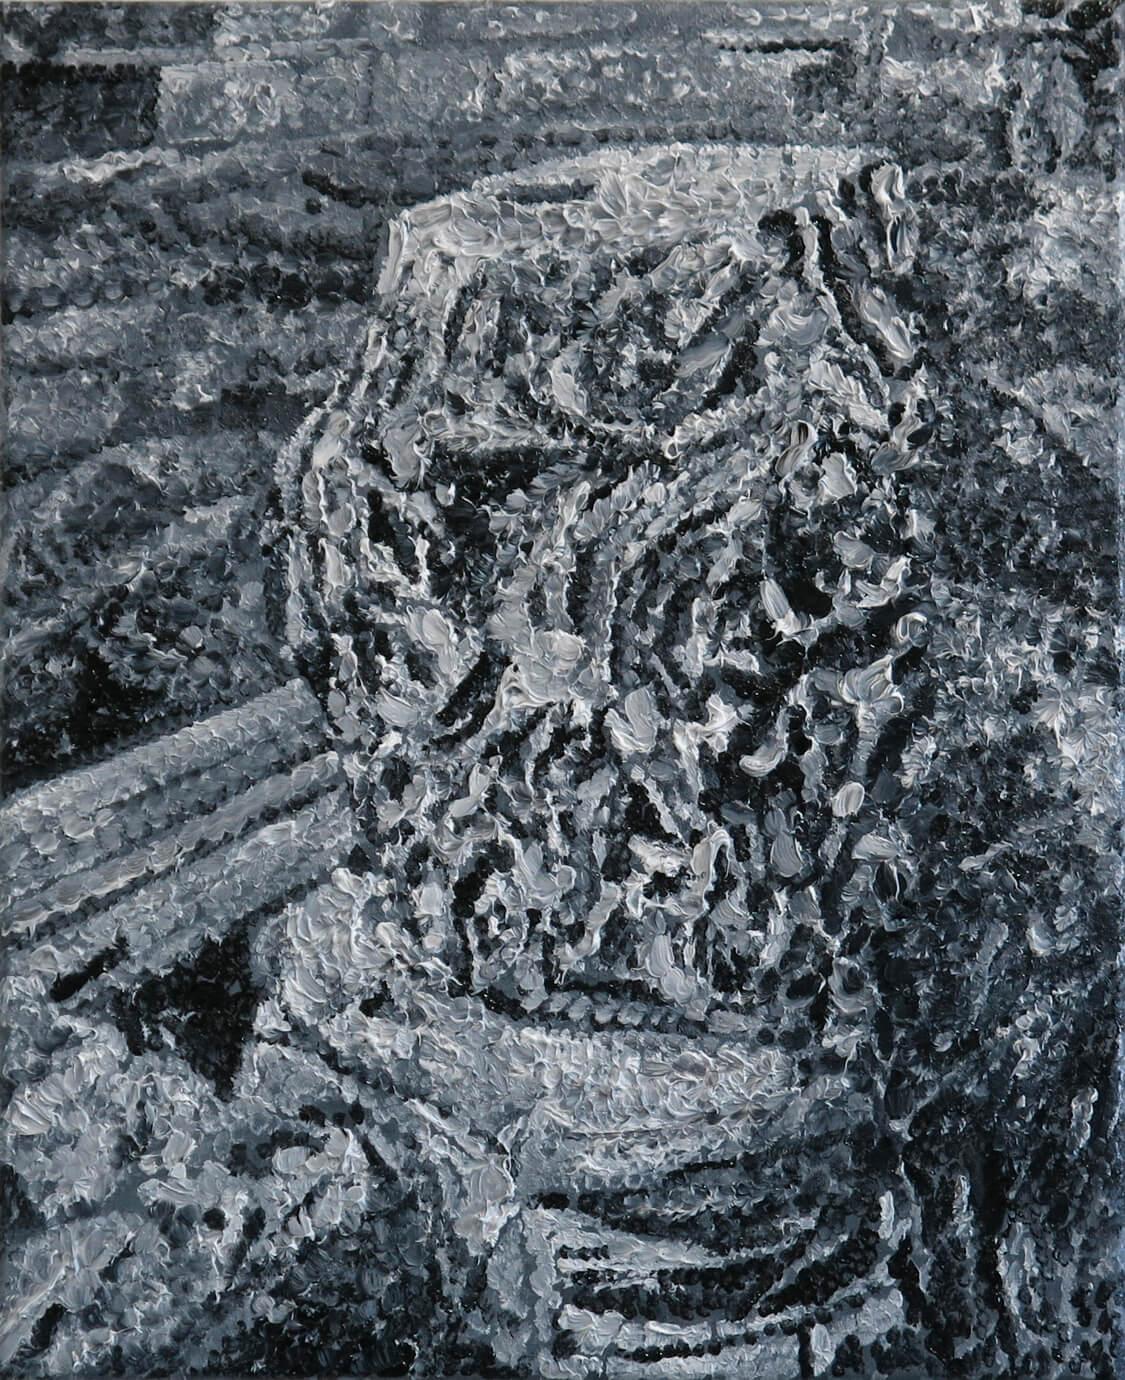 Roman Leftovers I - Oil on Canvas, 55 x 45 cm, 2013